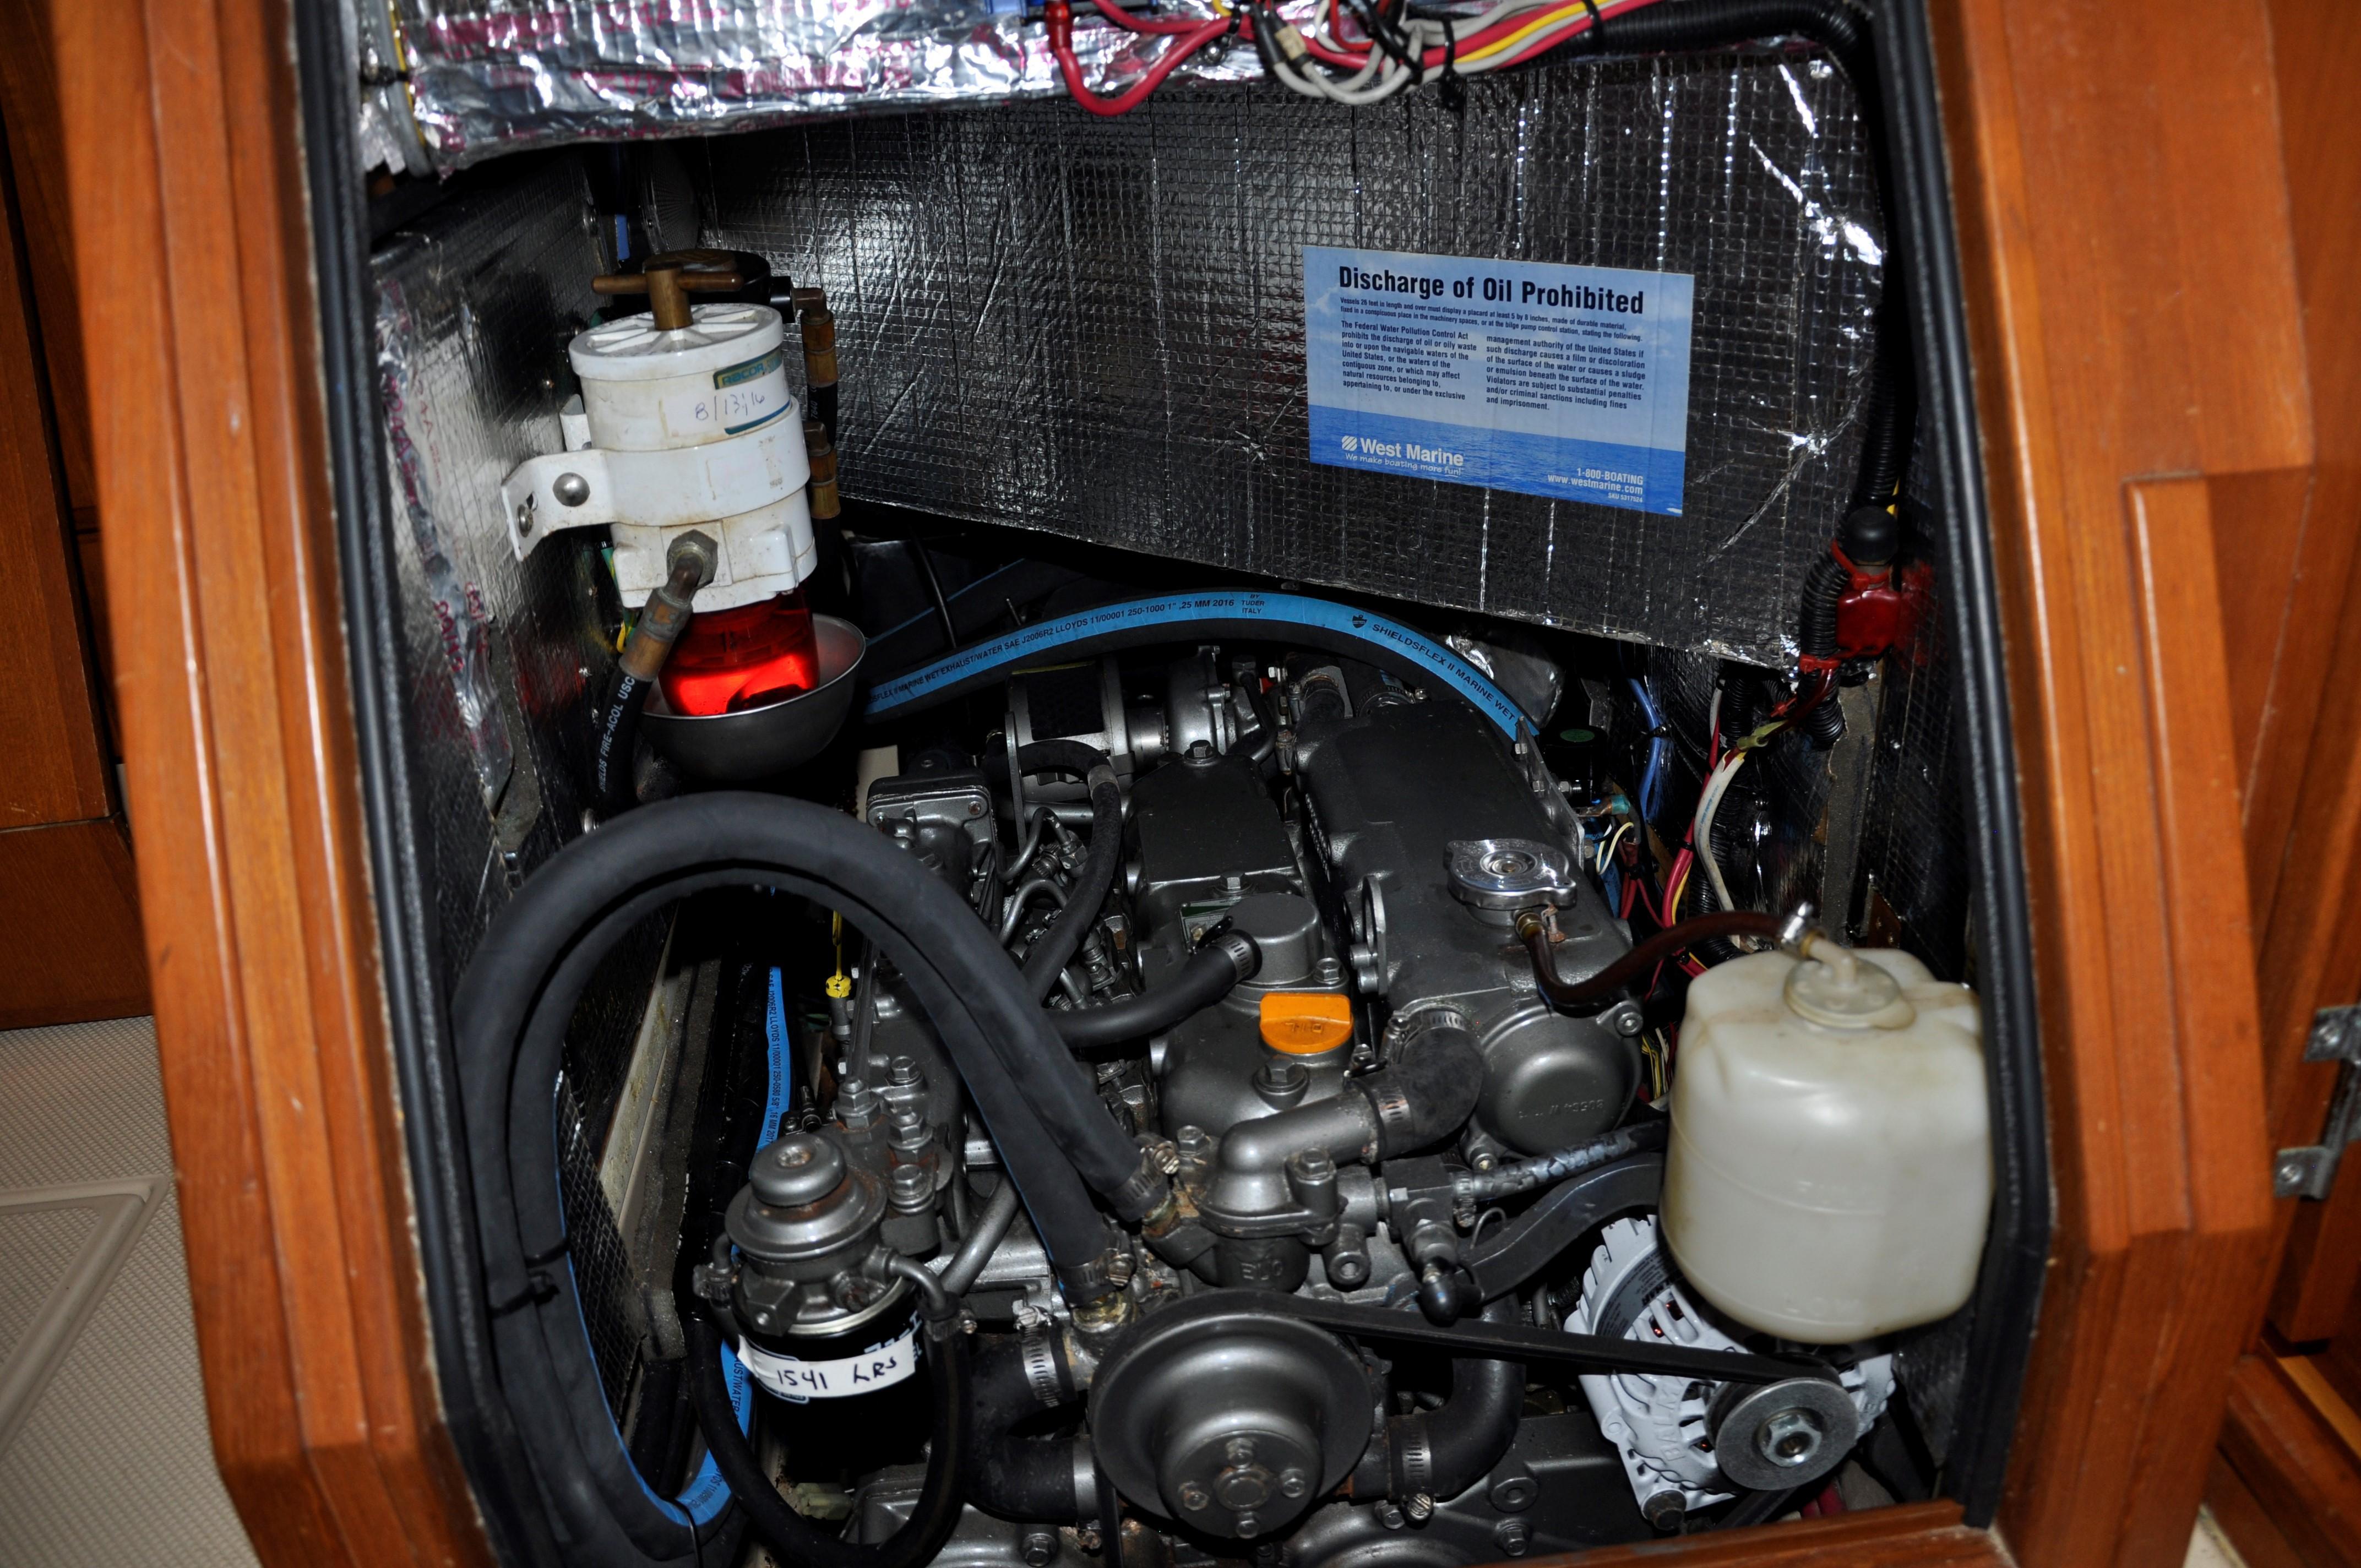 ENGINE ROOM UNDER COMPANIONWAY